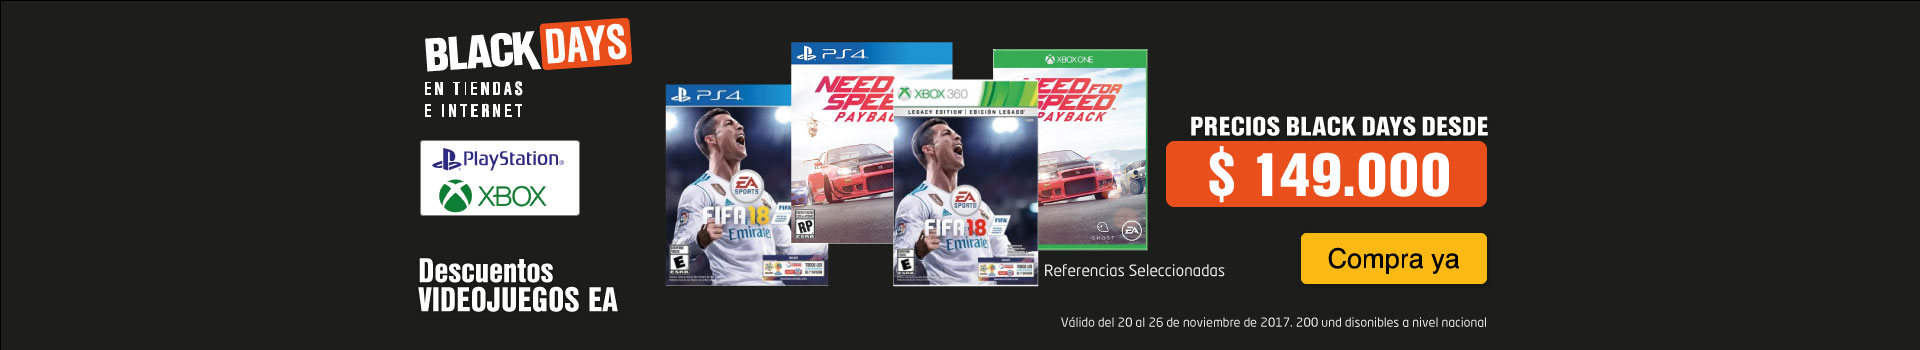 HIPER-AK-KT-8-videojuegos-videojuegos-blackdescea-cat-nov-18-22